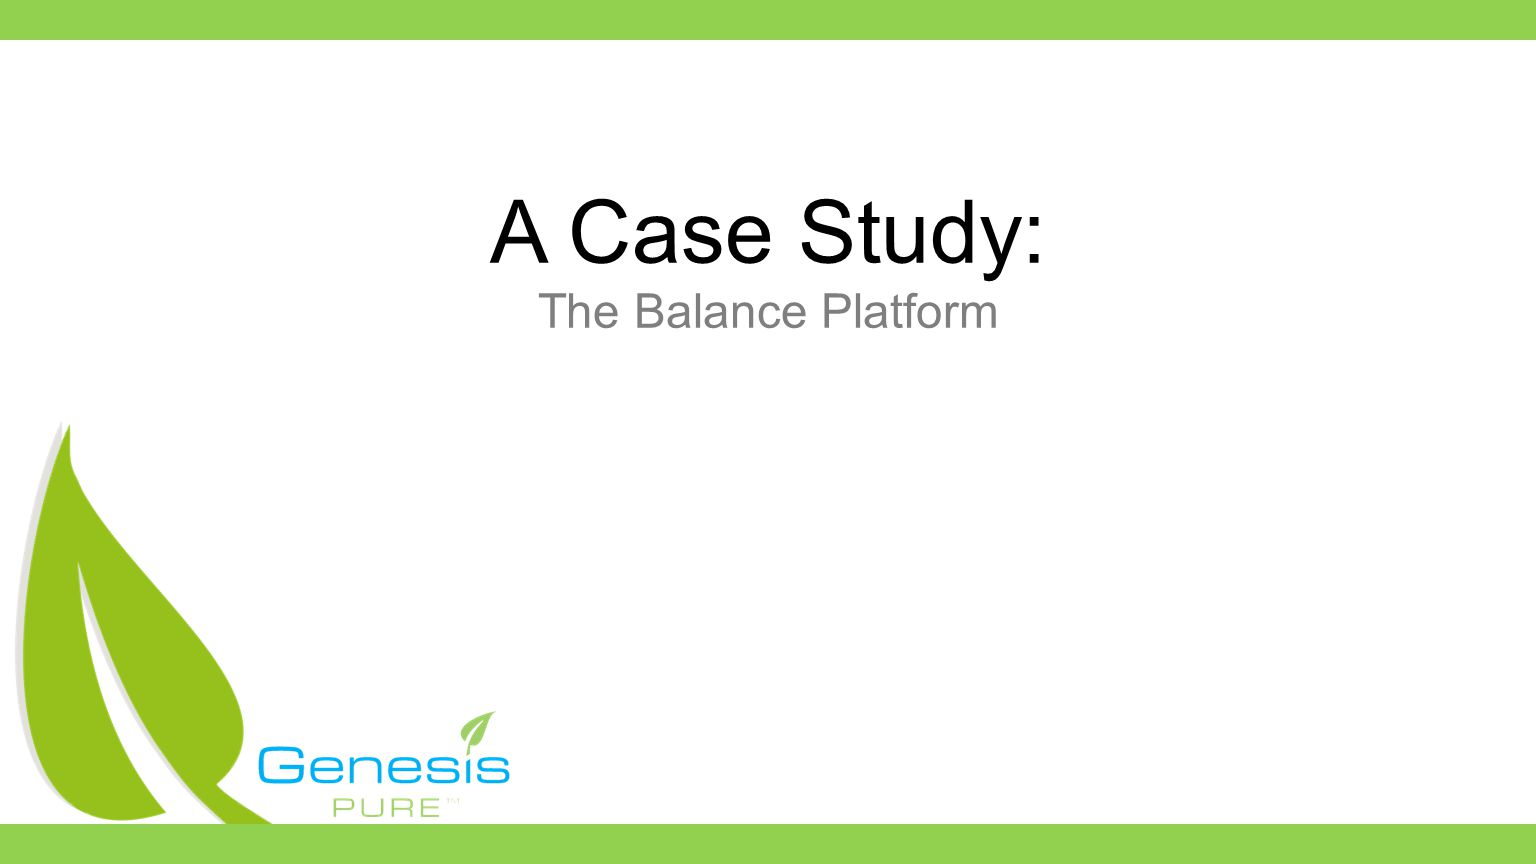 A Case Study: The Balance Platform